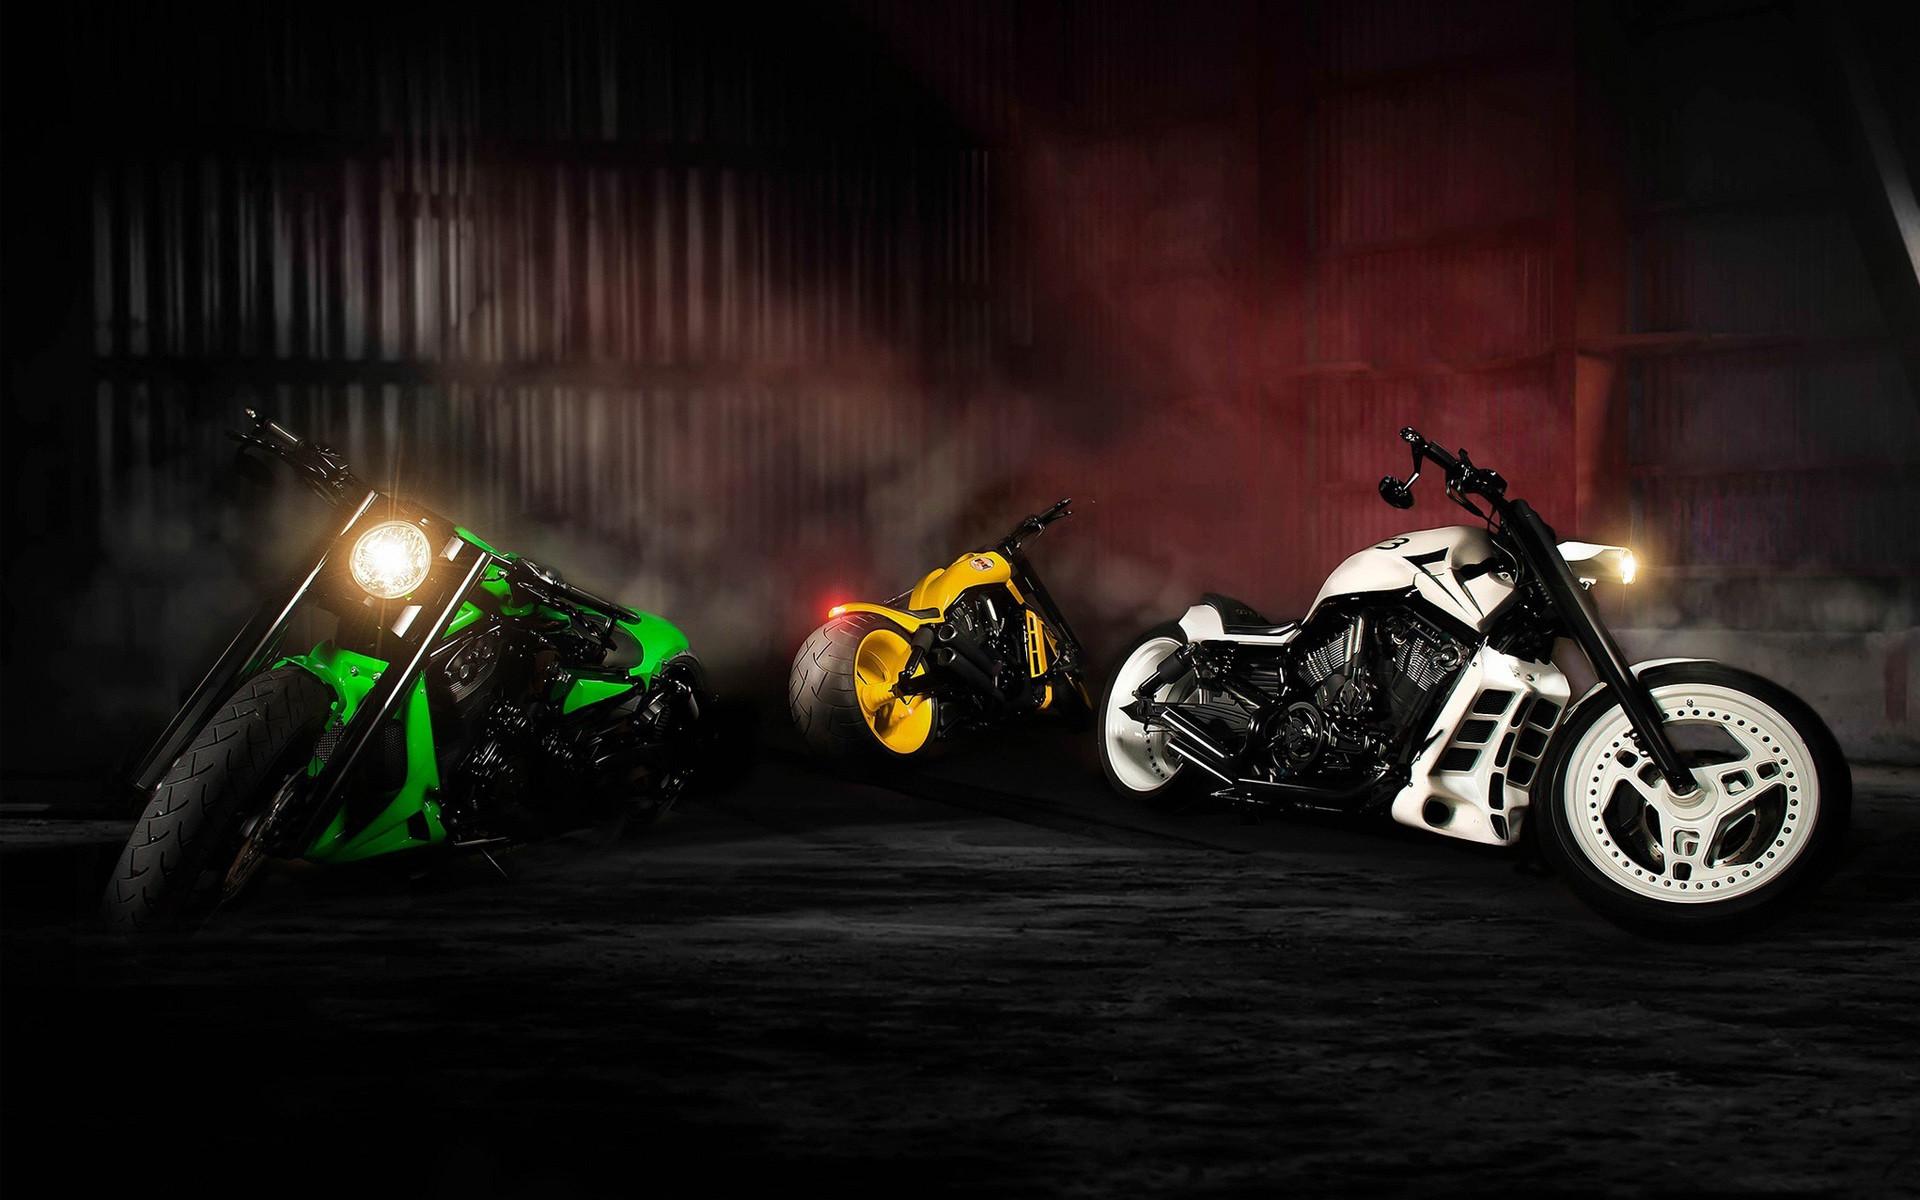 YAMAHA RAPTOR atv quad offroad motorbike bike dirtbike r wallpaper …    Download Wallpaper   Pinterest   Wallpaper